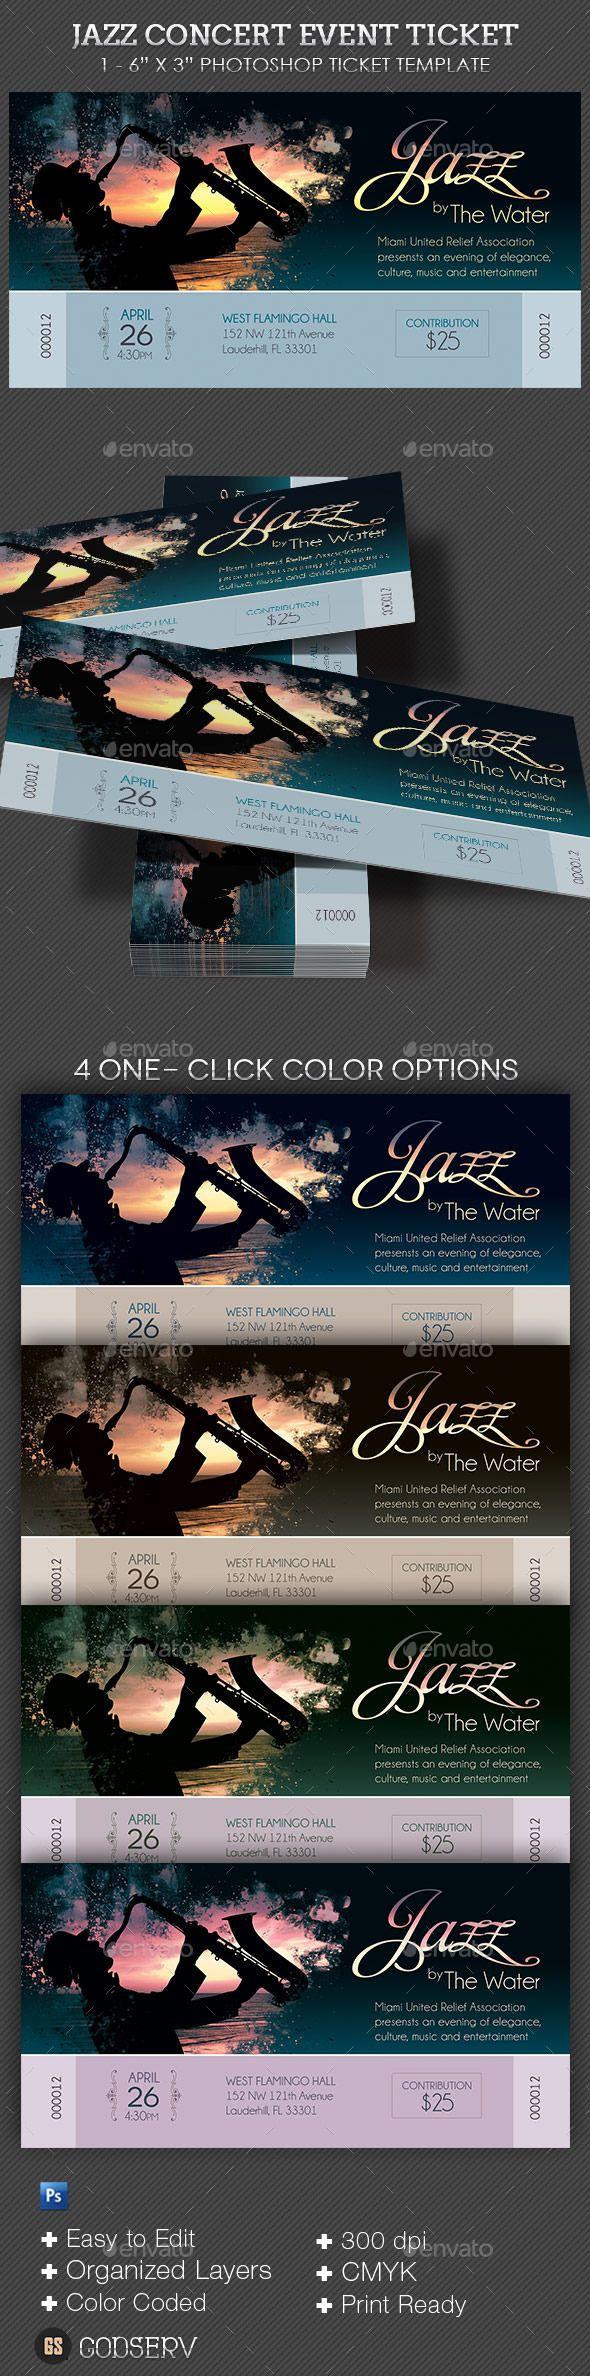 Jazz Concert Event Ticket Template PSD. Download here: https://graphicriver.net/item/jazz-concert-event-ticket/10257691?ref=ksioks